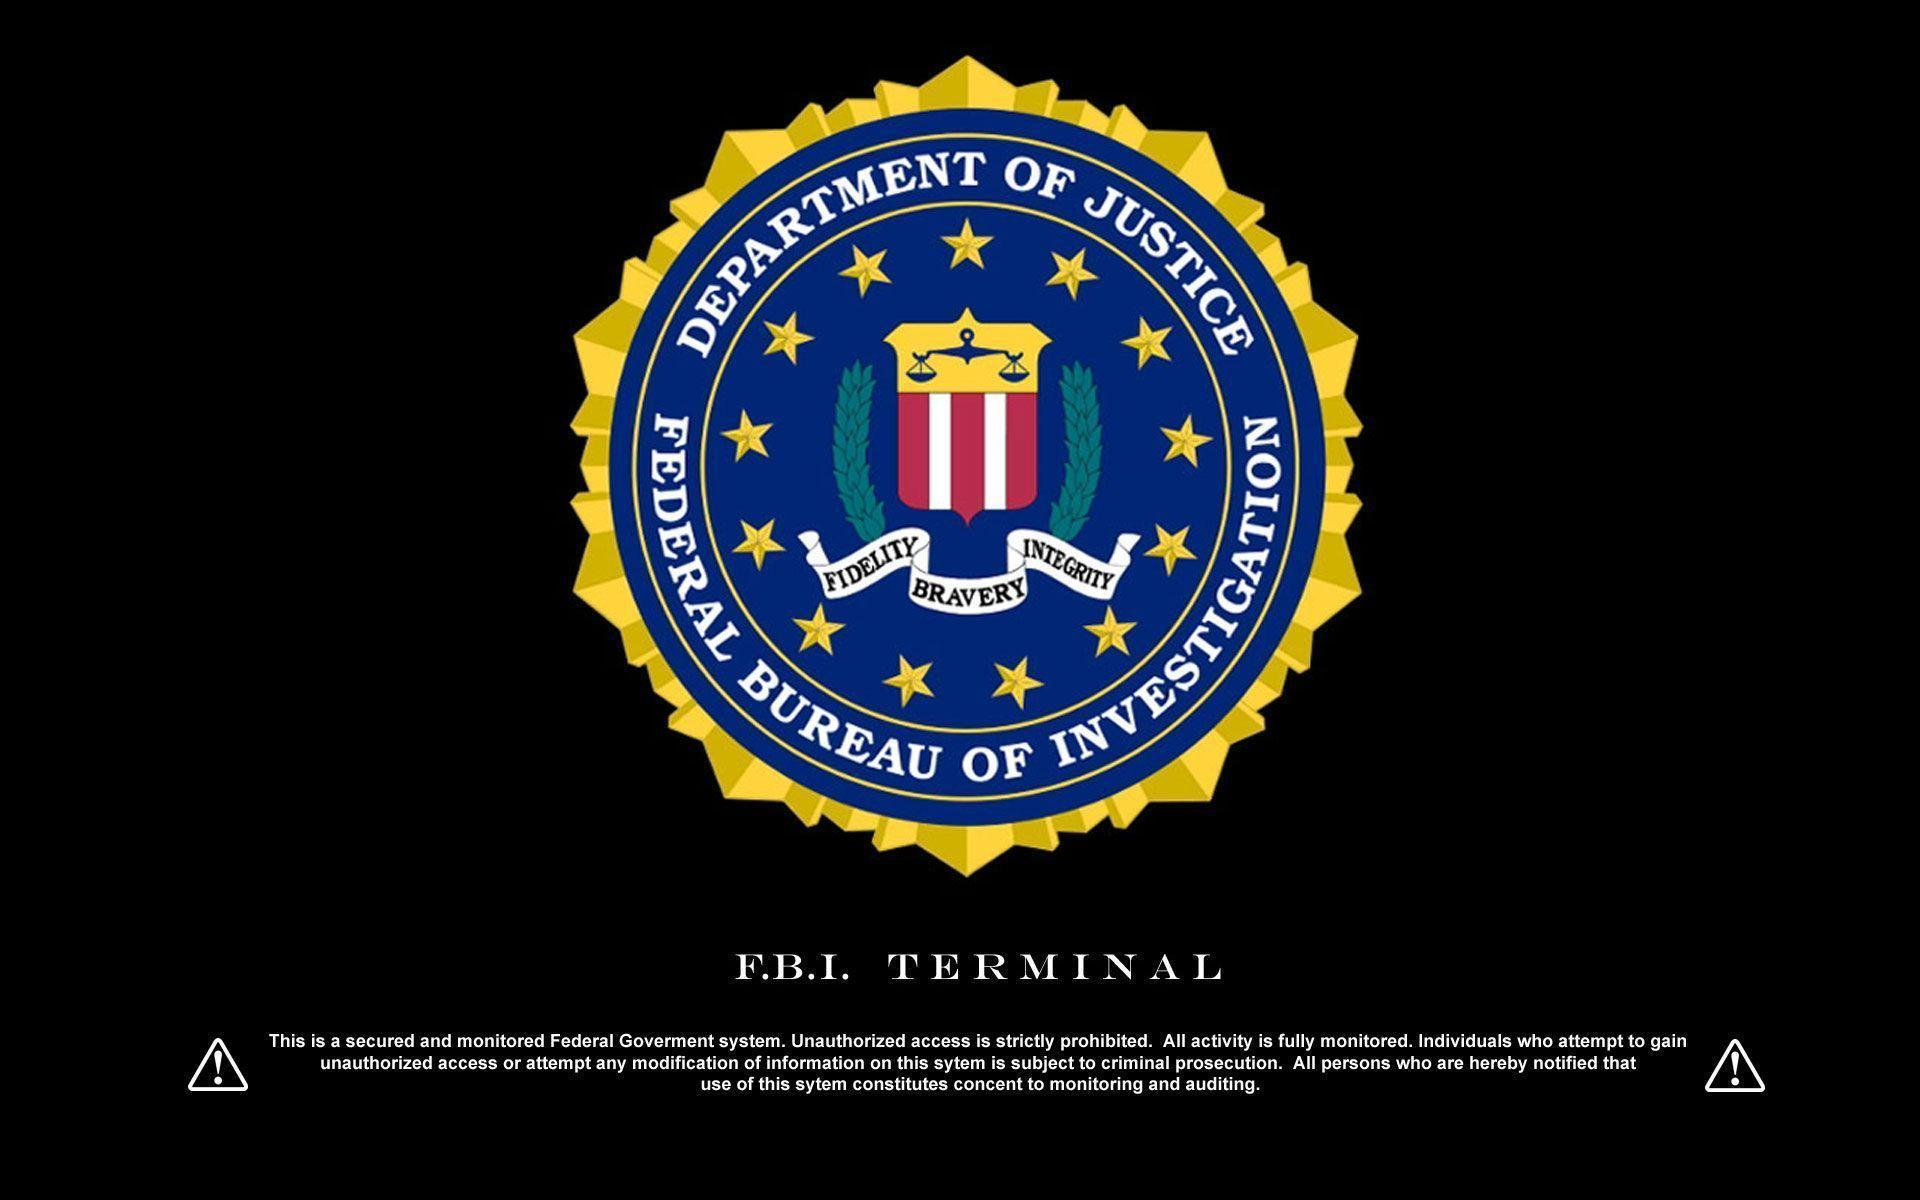 Fbi Wallpapers - Full HD wallpaper search